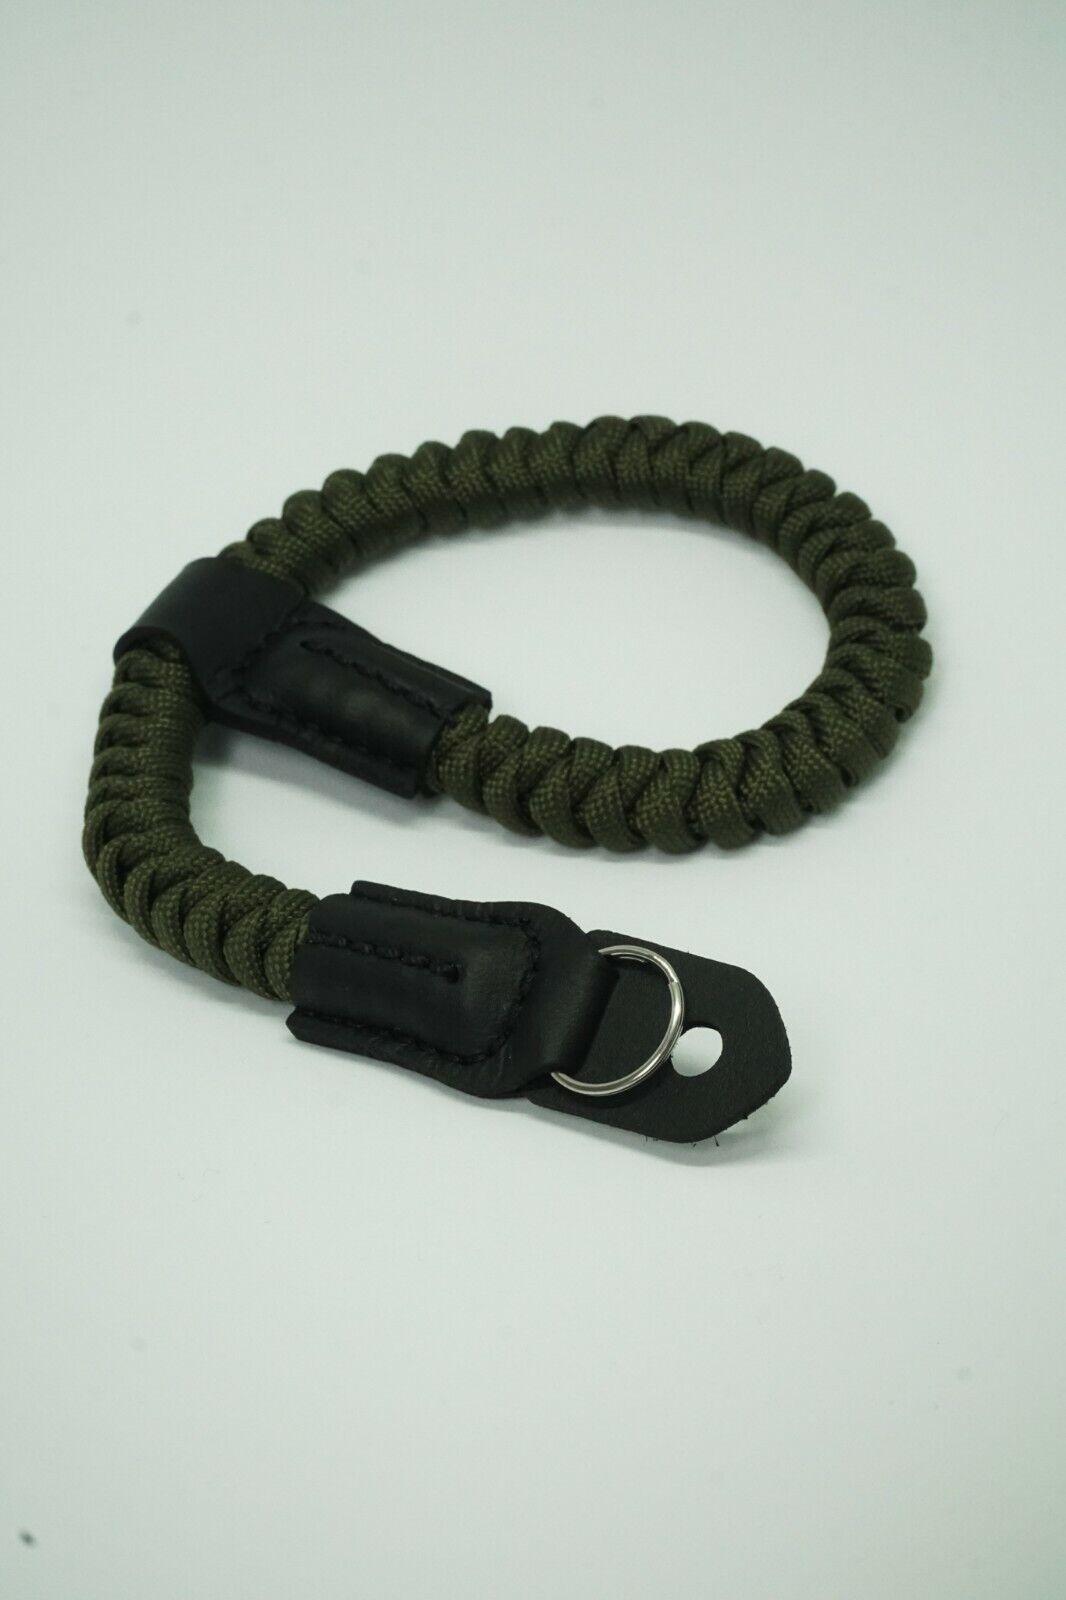 Paracord Wrist Camera Strap by NEVETdesigns | Climbing Rope DSLR Film Mirrorless